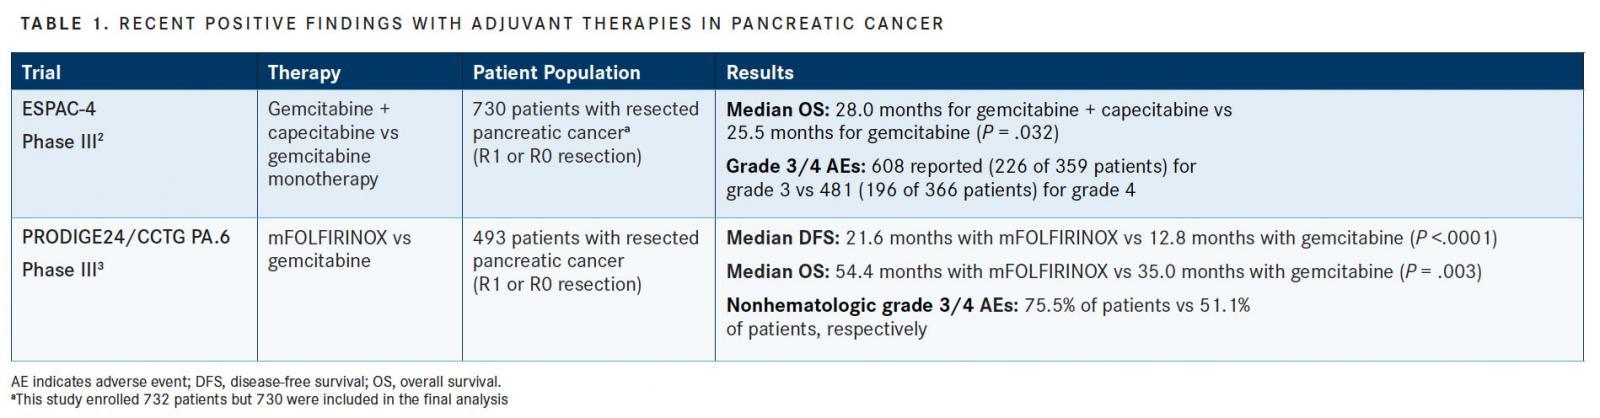 vestibular papillomatosis cryotherapy endometrial cancer kombucha